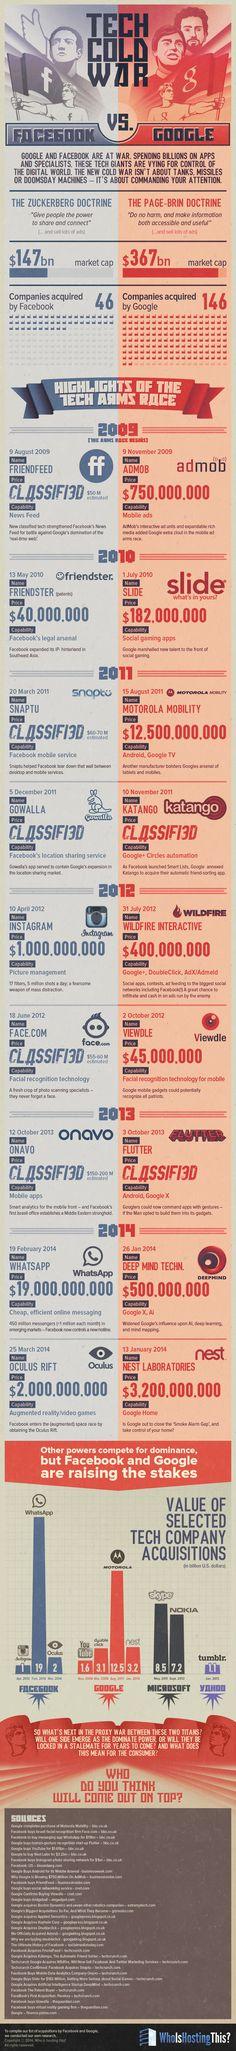 Google vs. Facebook: Who Is Winning The Tech Cold War? - No B.S. University http://www.NOBSU.com